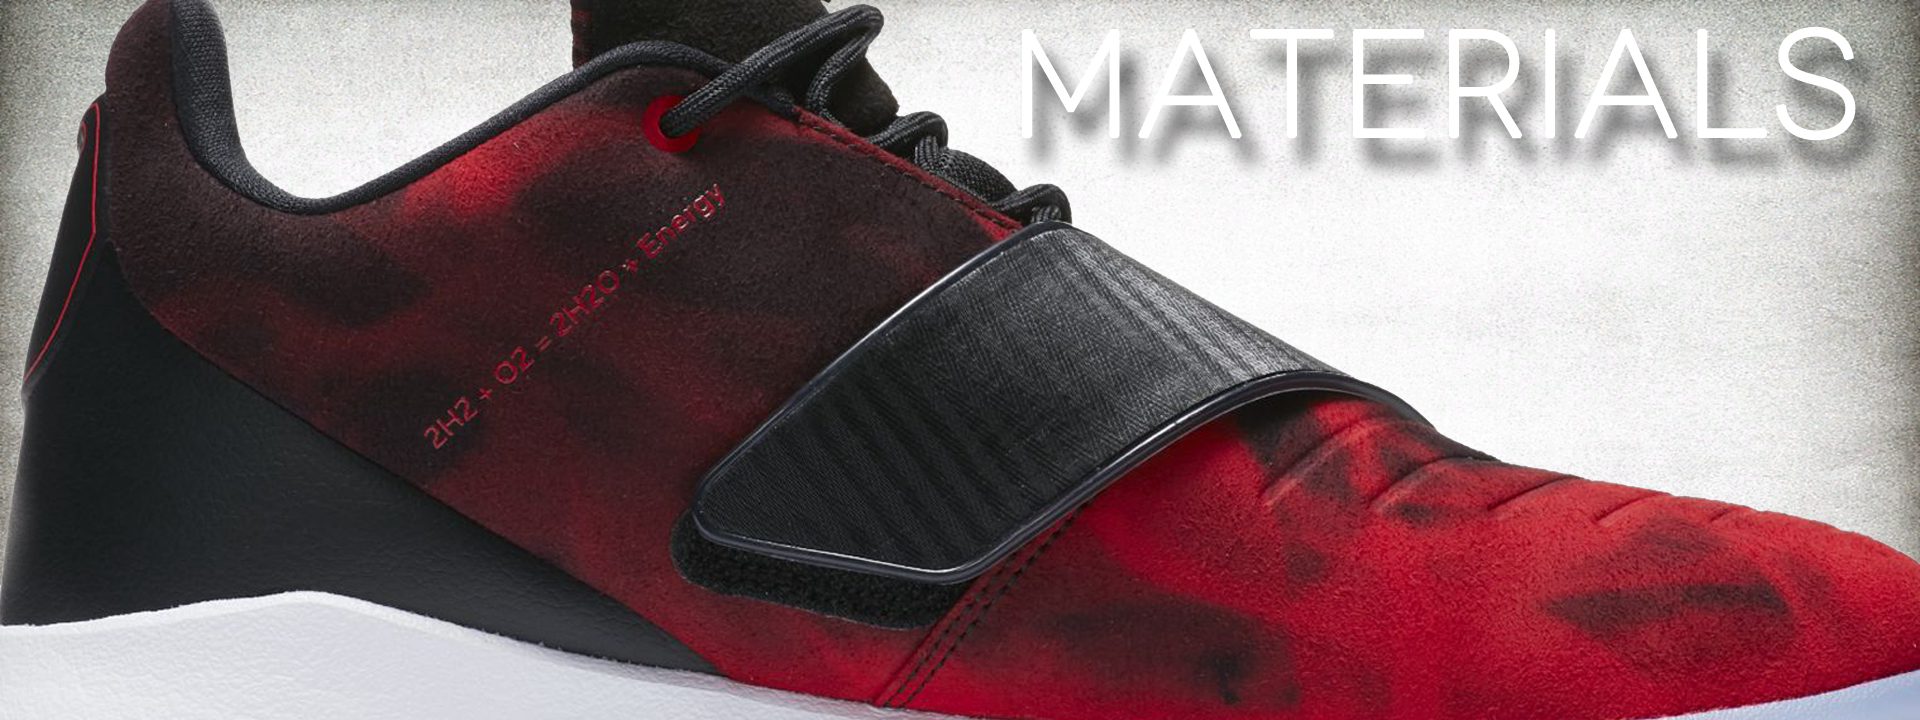 Jordan CP3.XI performance review duke4005 materials